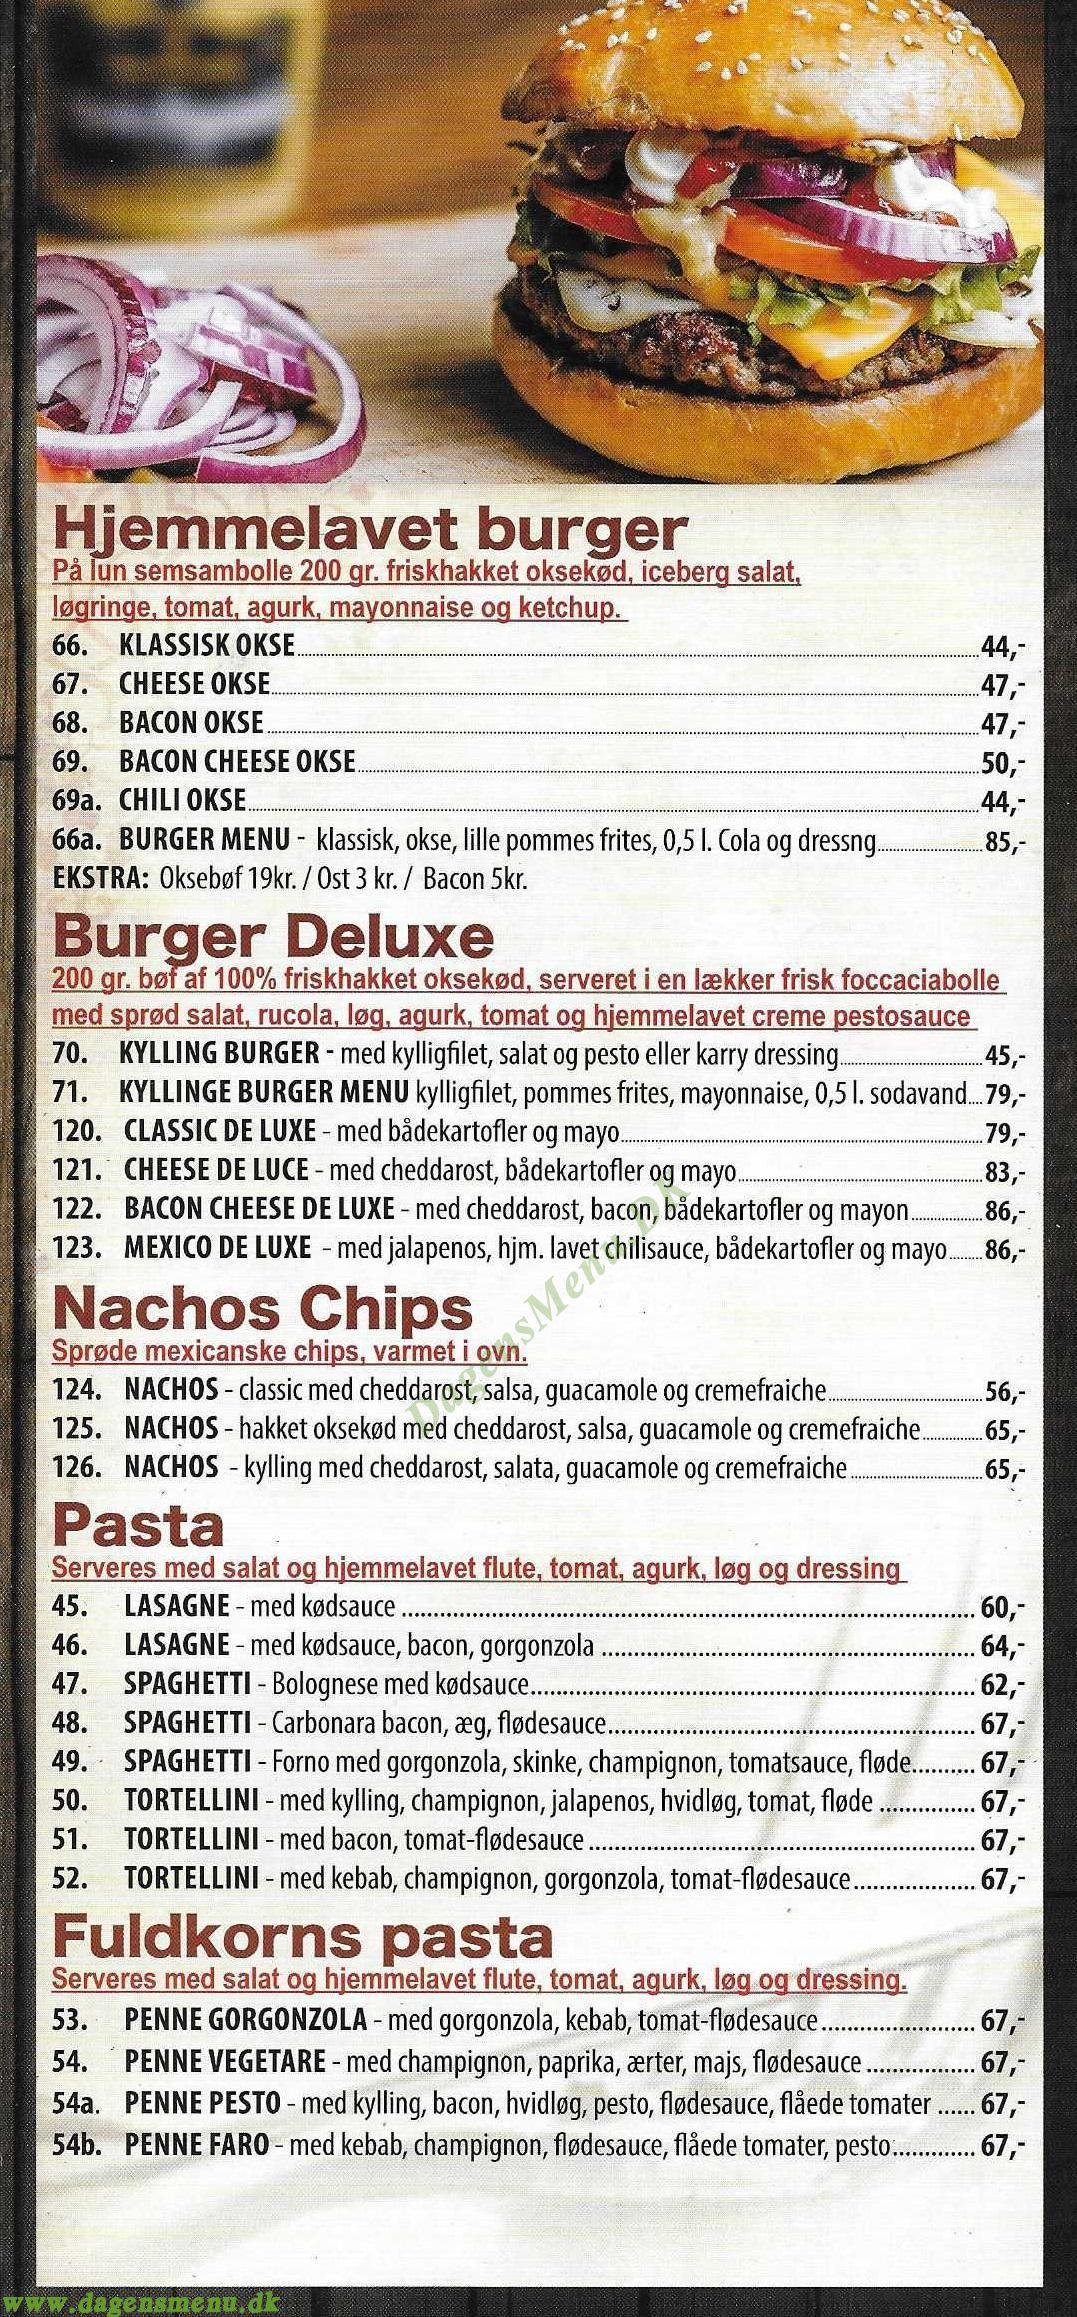 Dilan's pizza & burger house - Menukort